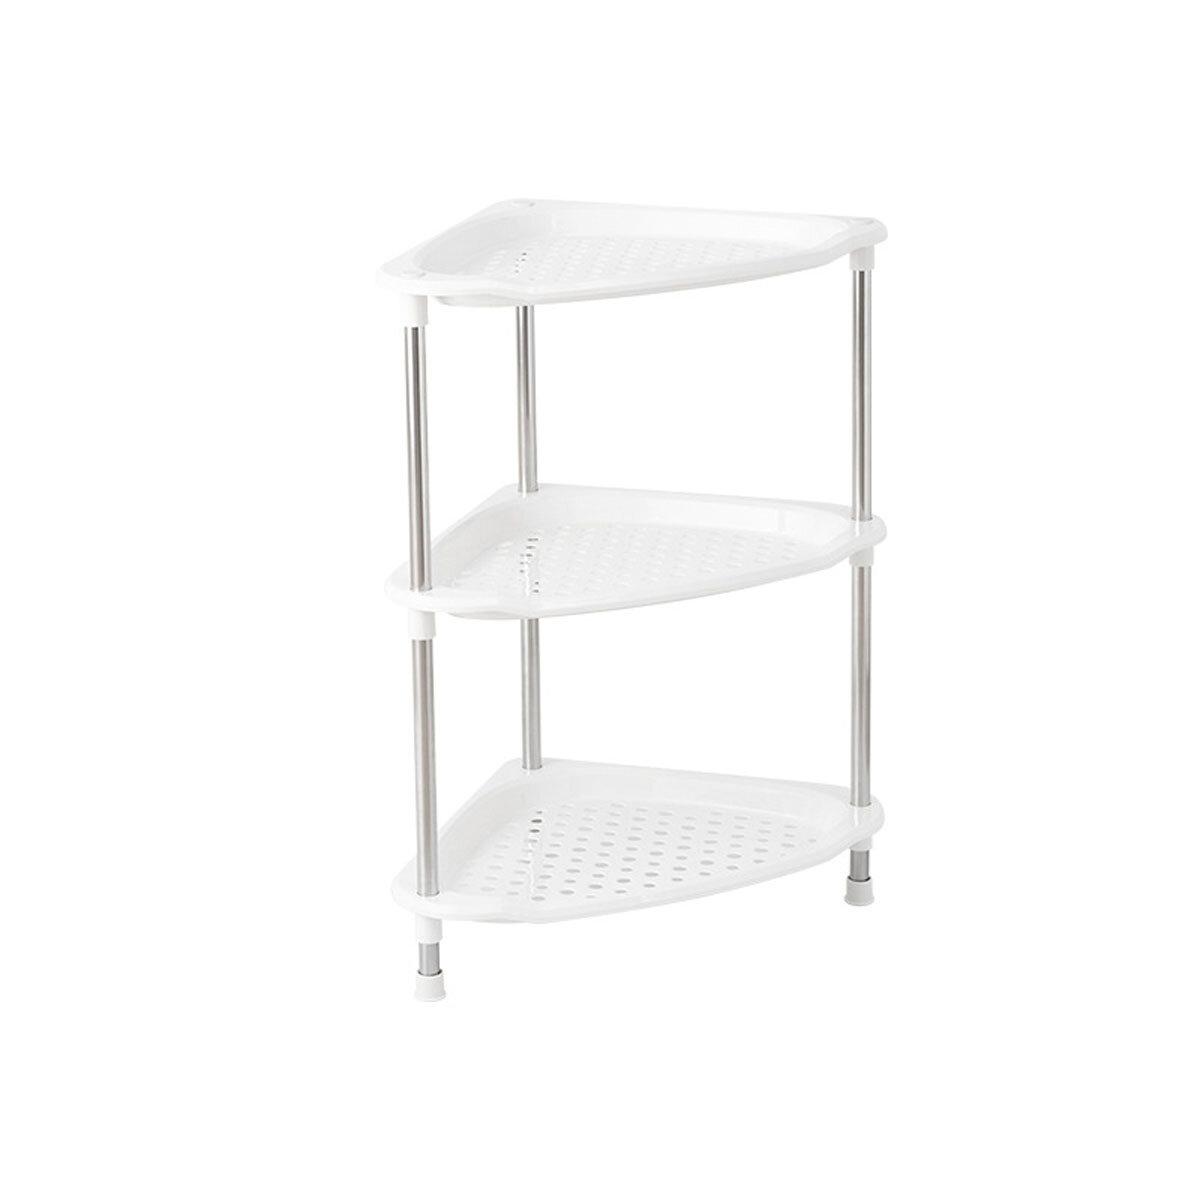 4 Layers Corner Rack Shelf Bathroom Kitchen Storage Baskets Space Saving